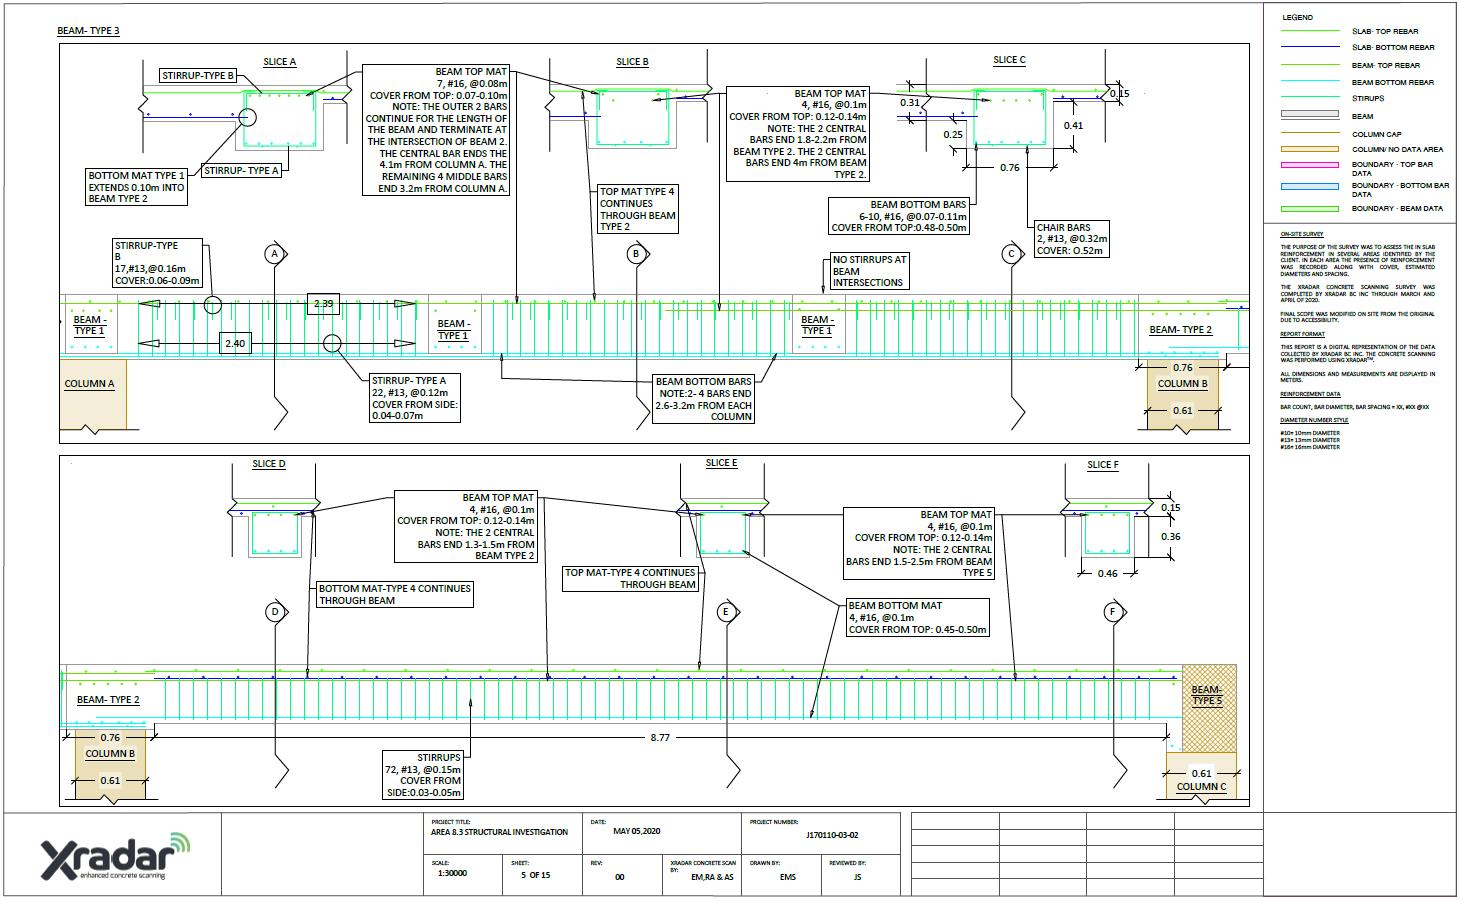 Xradar Structural Investigation Drawing